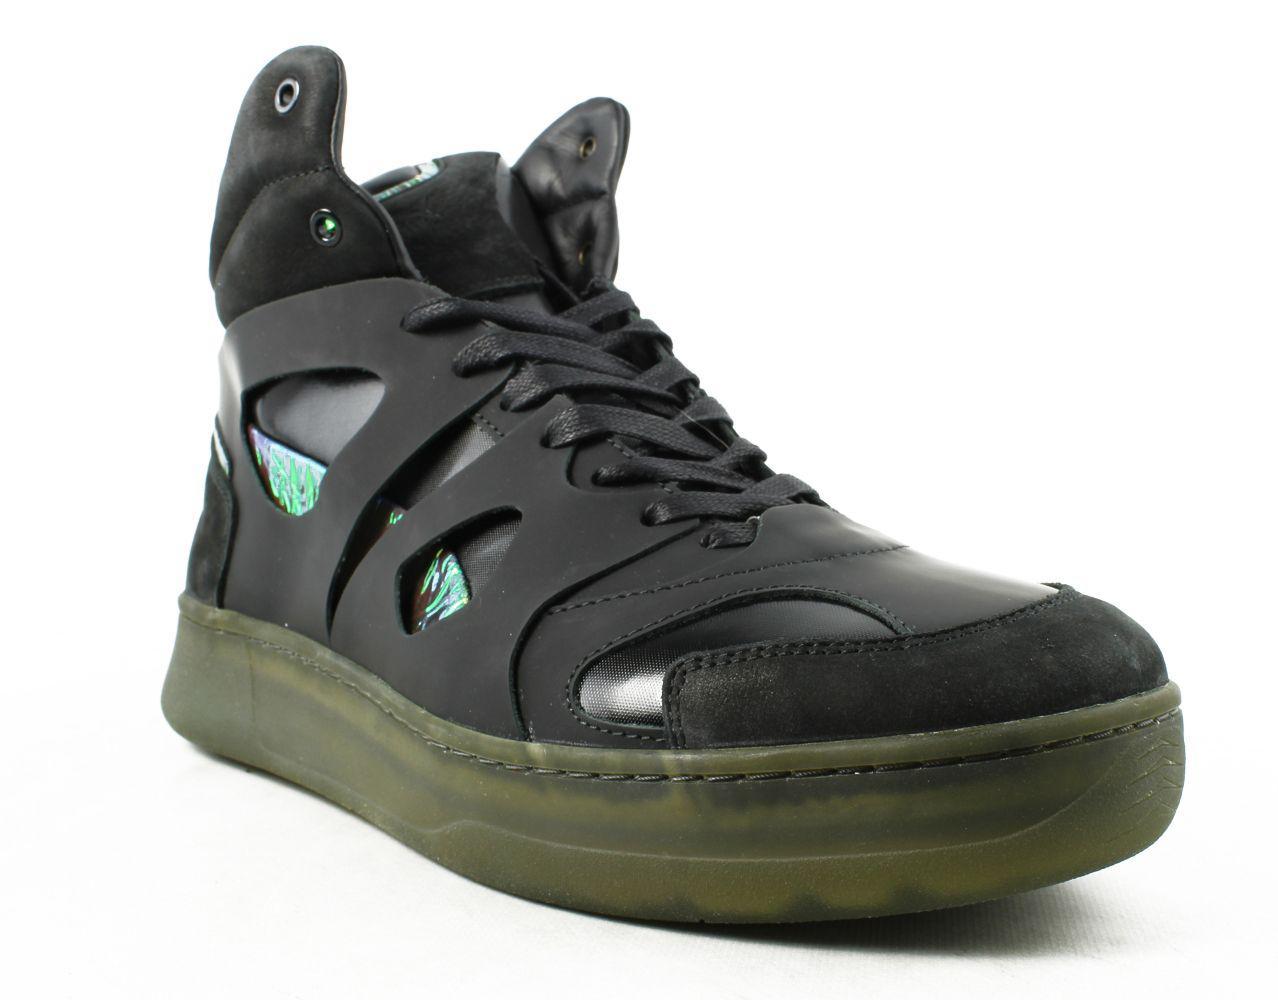 5a5df72c3d84 Lyst - Puma Mens Mcq Move Mid Black black Fashion Shoes Size 12 in ...